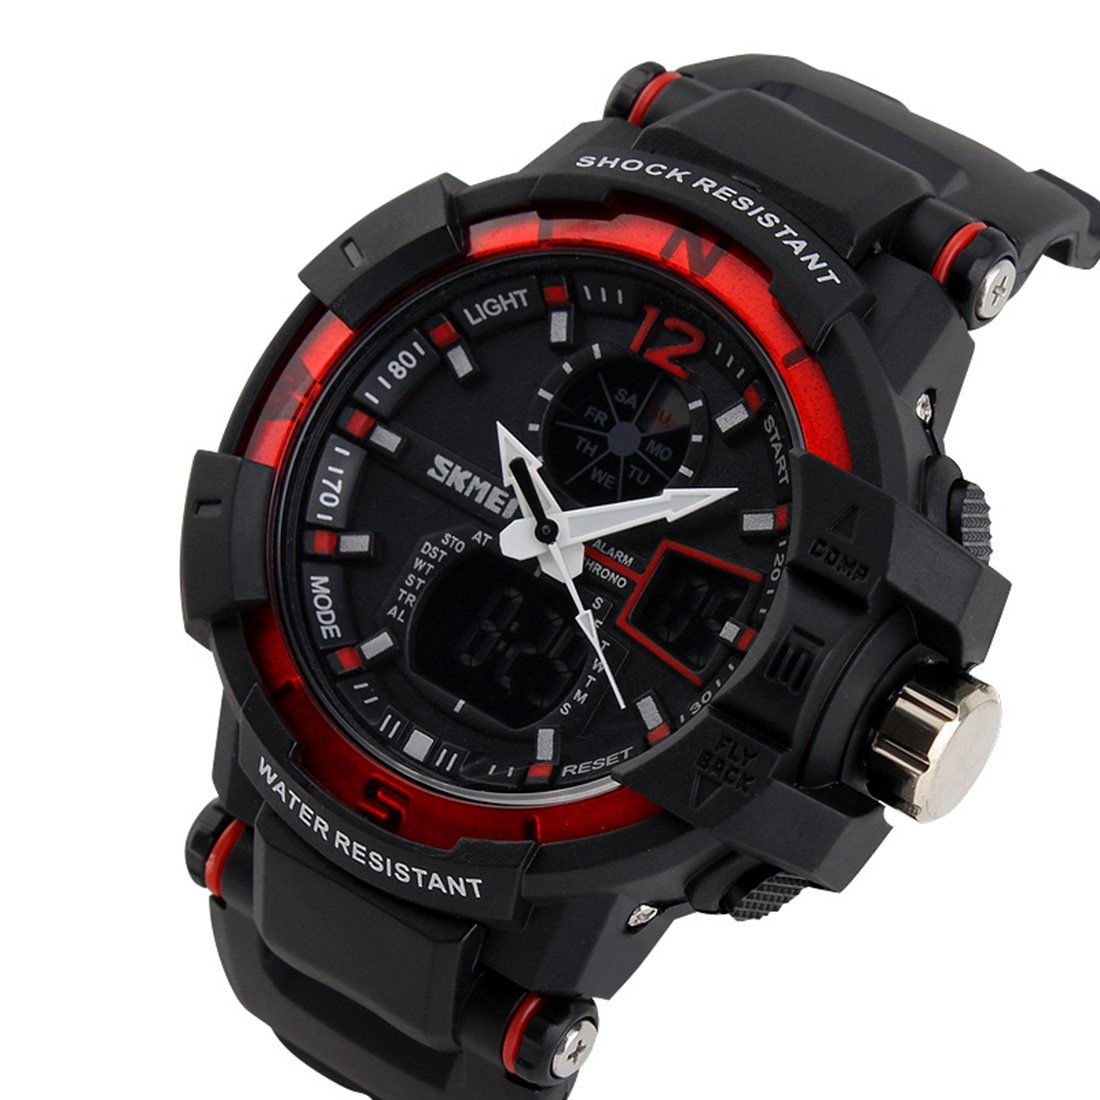 Amazon.com: SKM Multi-Function Outdoor Sport Watch Running ...